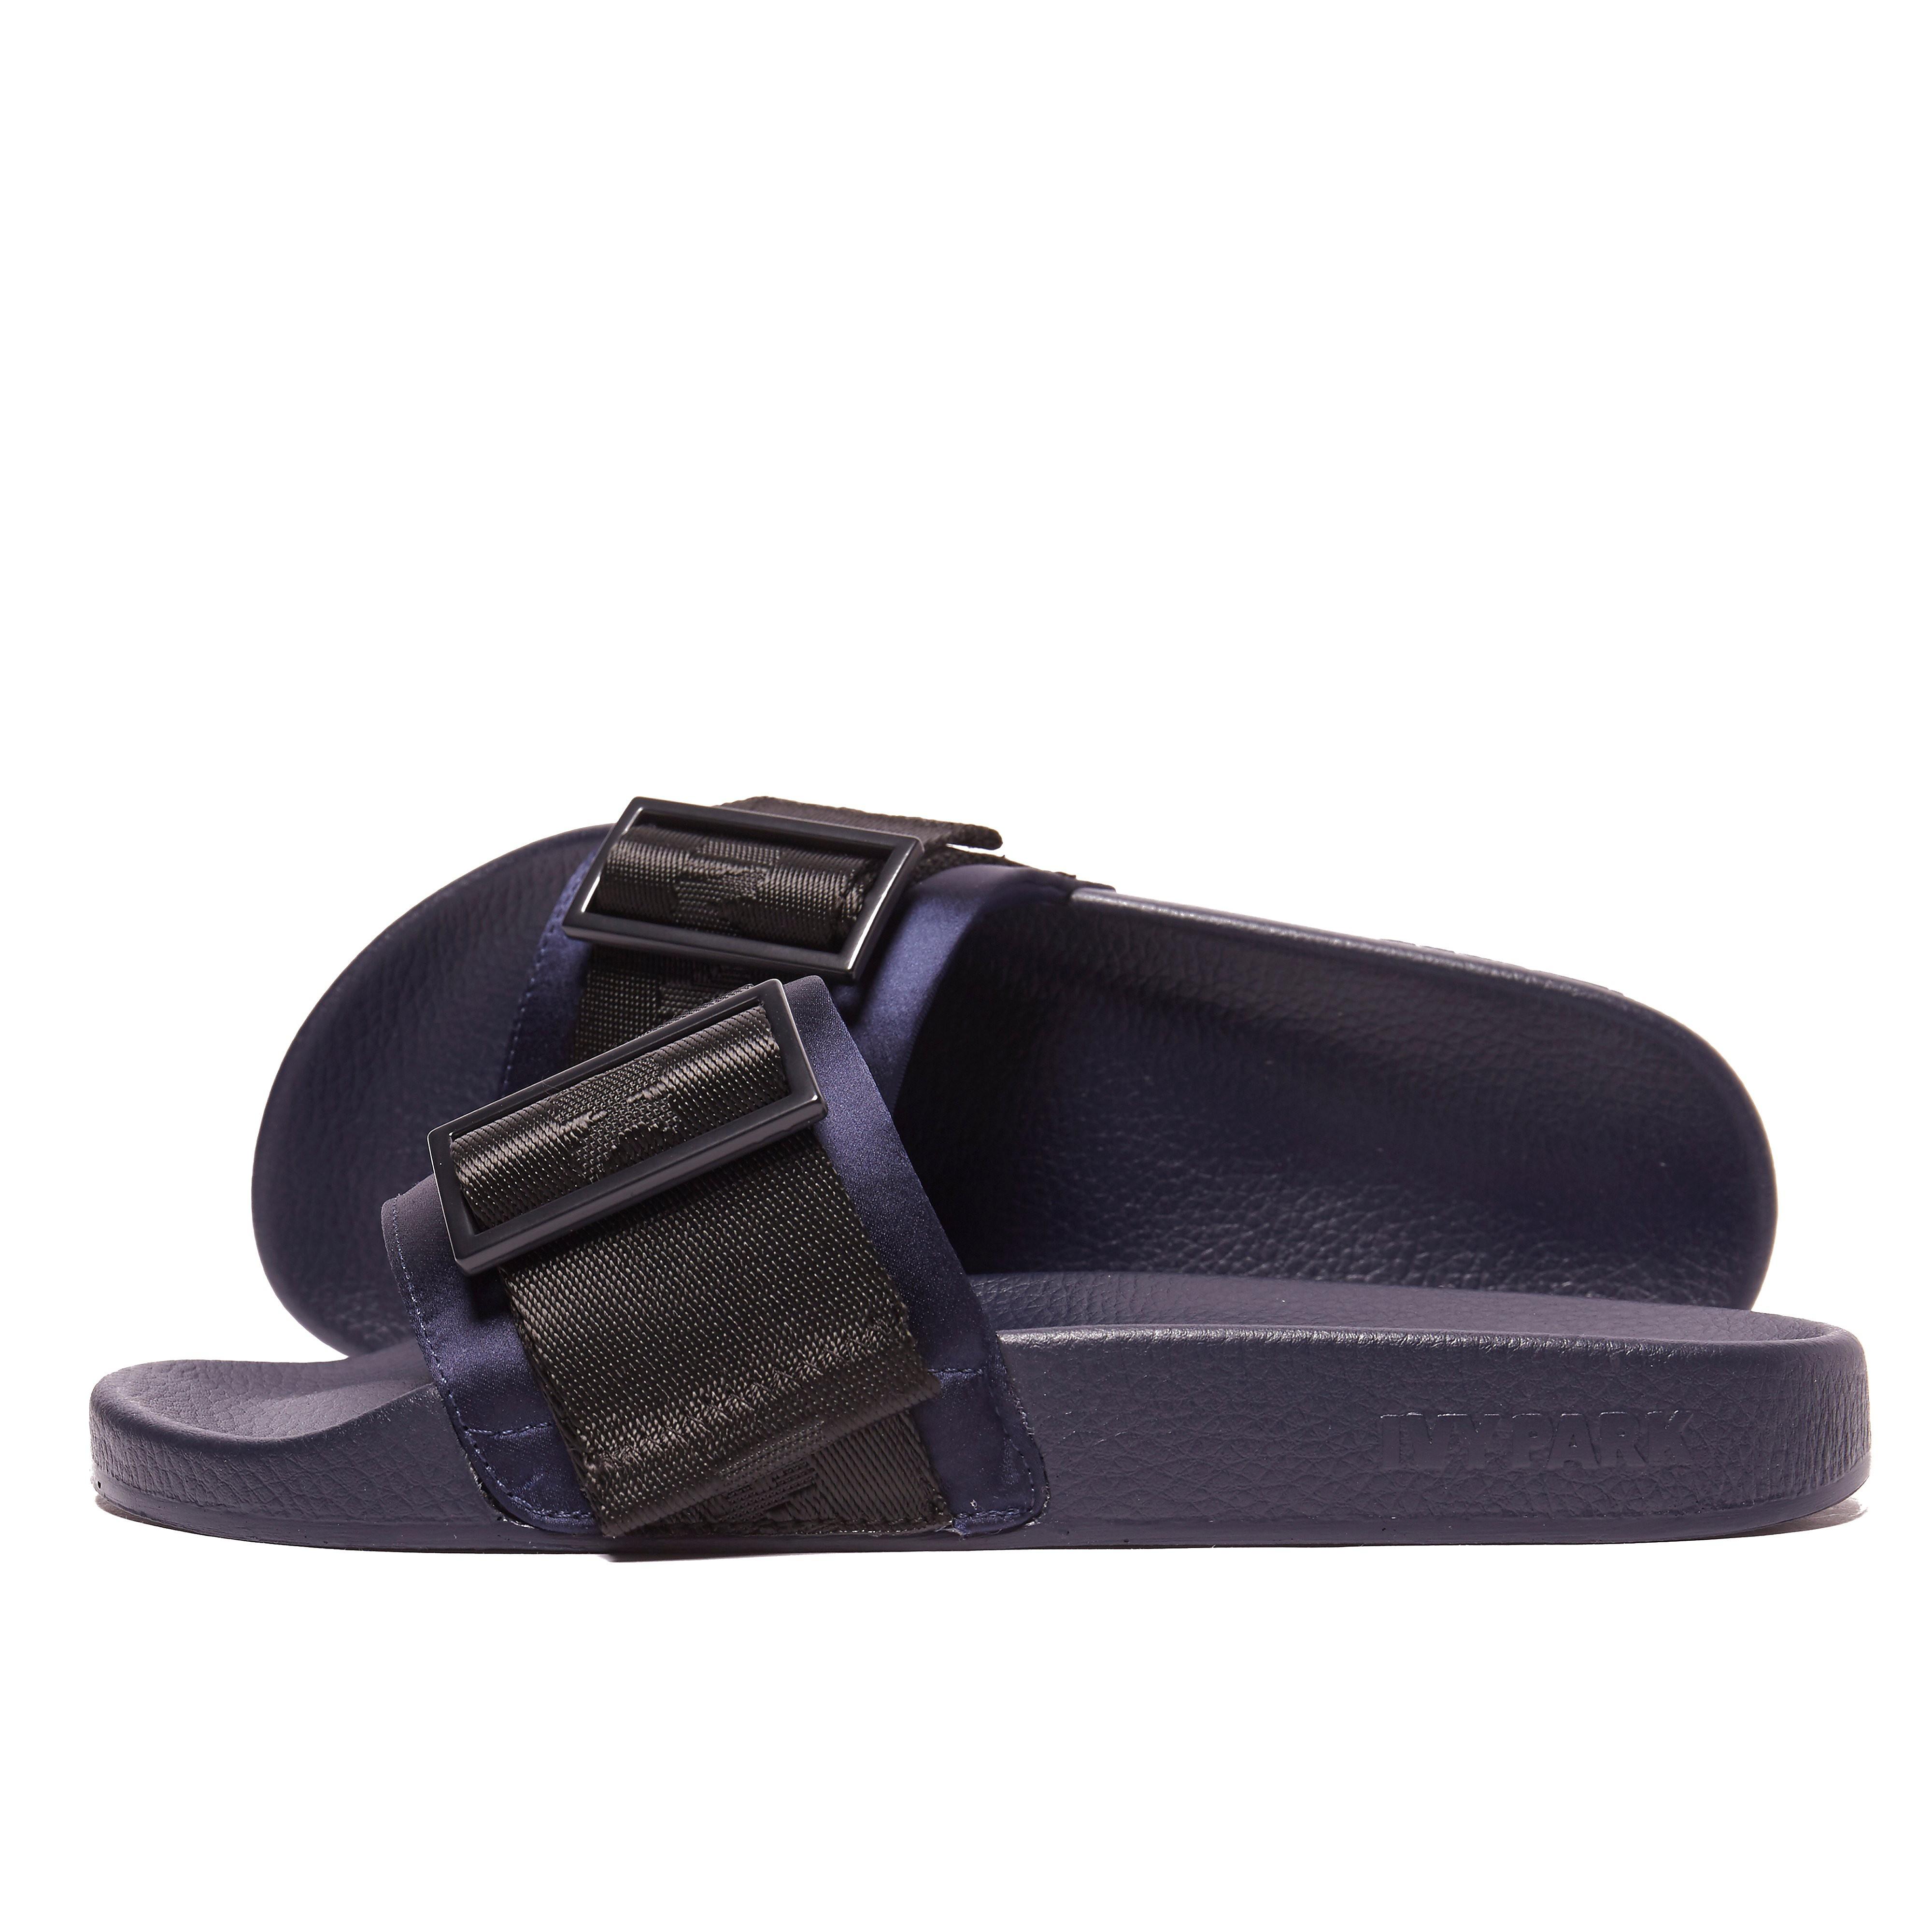 IVY PARK Strap Slides Women's